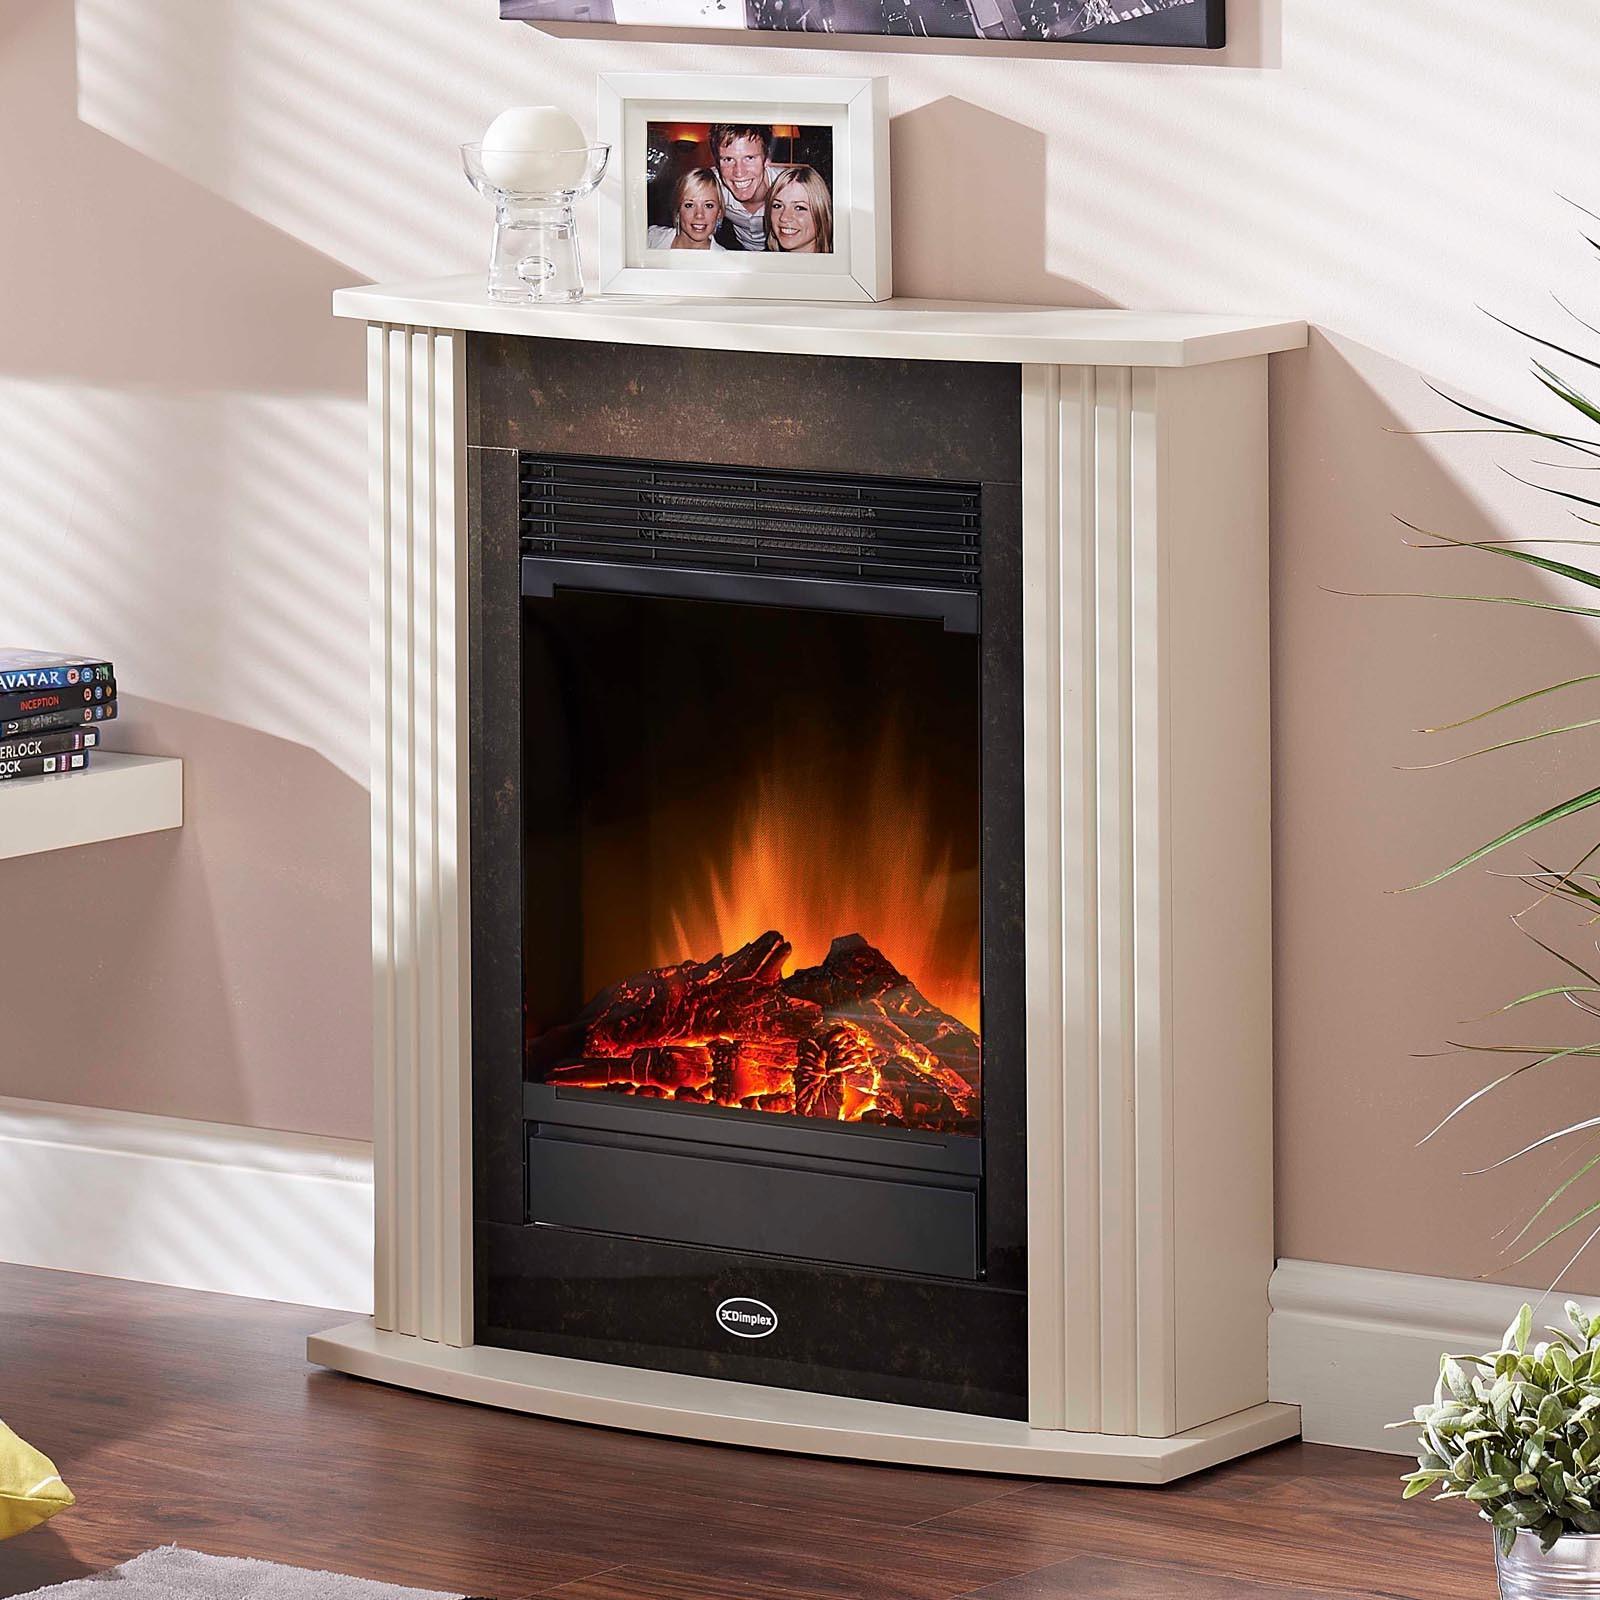 Outstanding Dimplex Mini Mozart Quality Fireplaces Home Interior And Landscaping Mentranervesignezvosmurscom